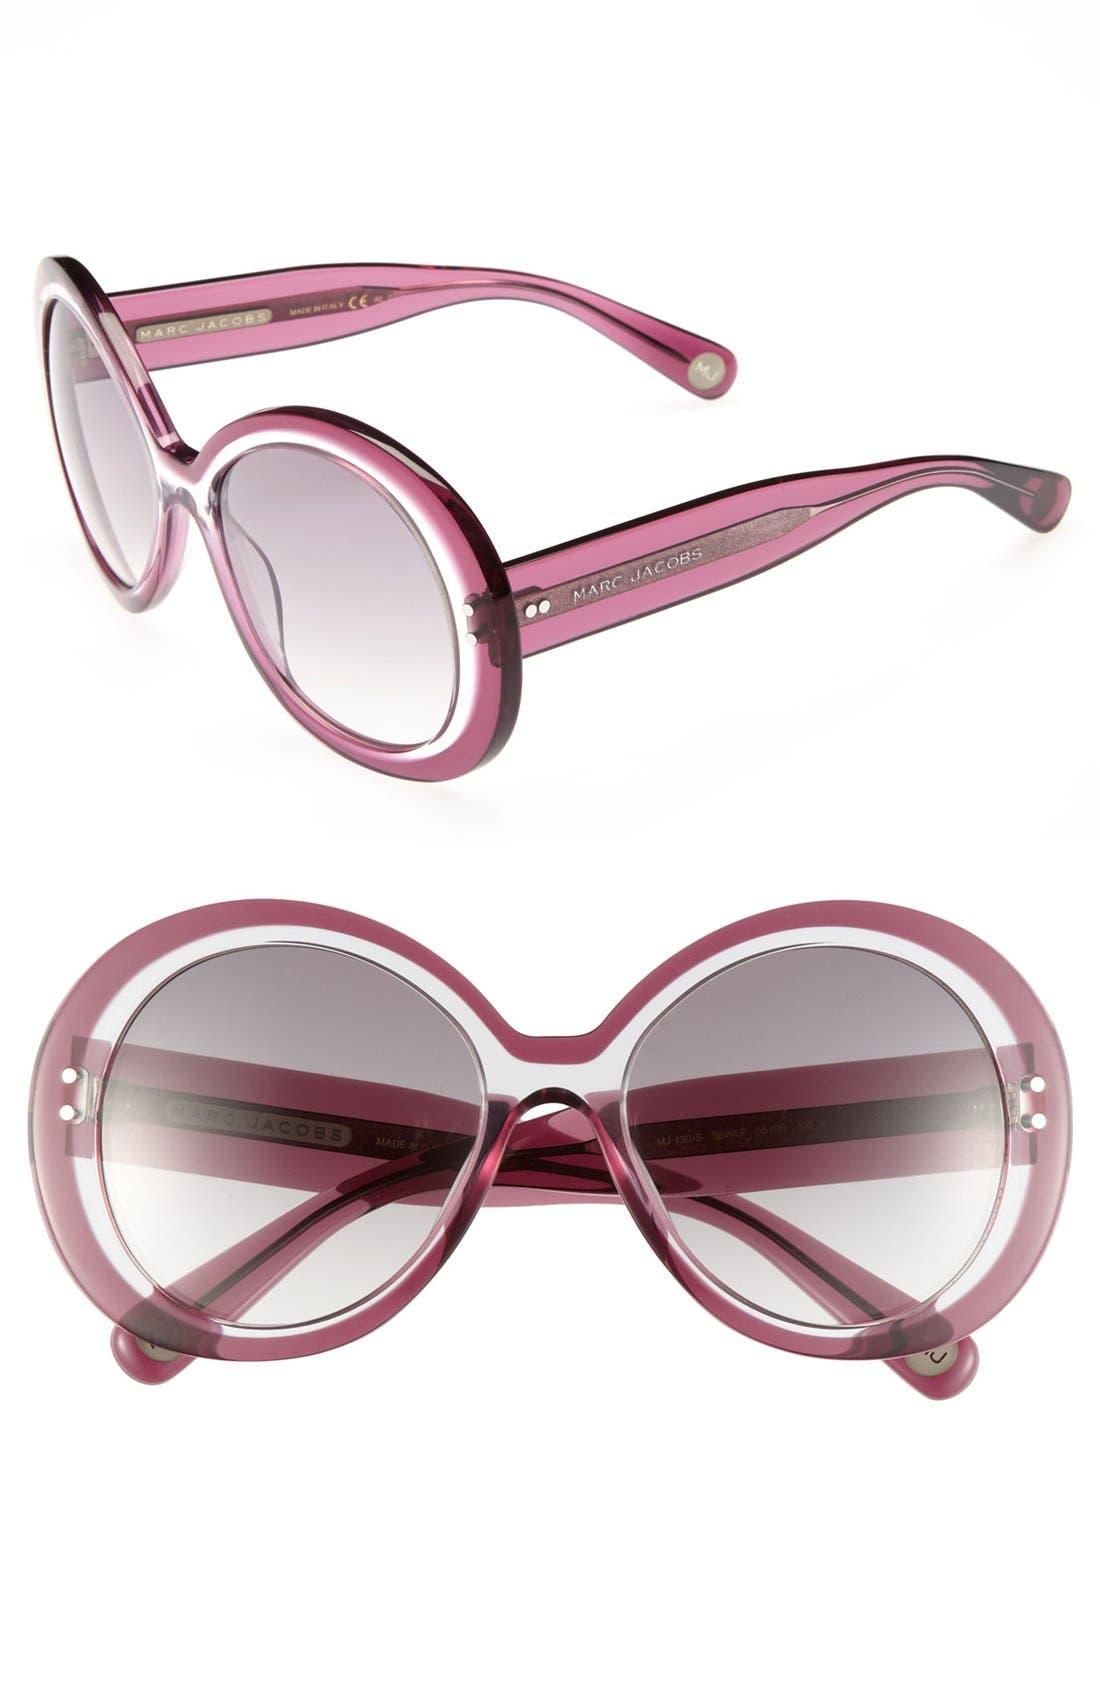 Main Image - MARC JACOBS 55mm Oversized Sunglasses